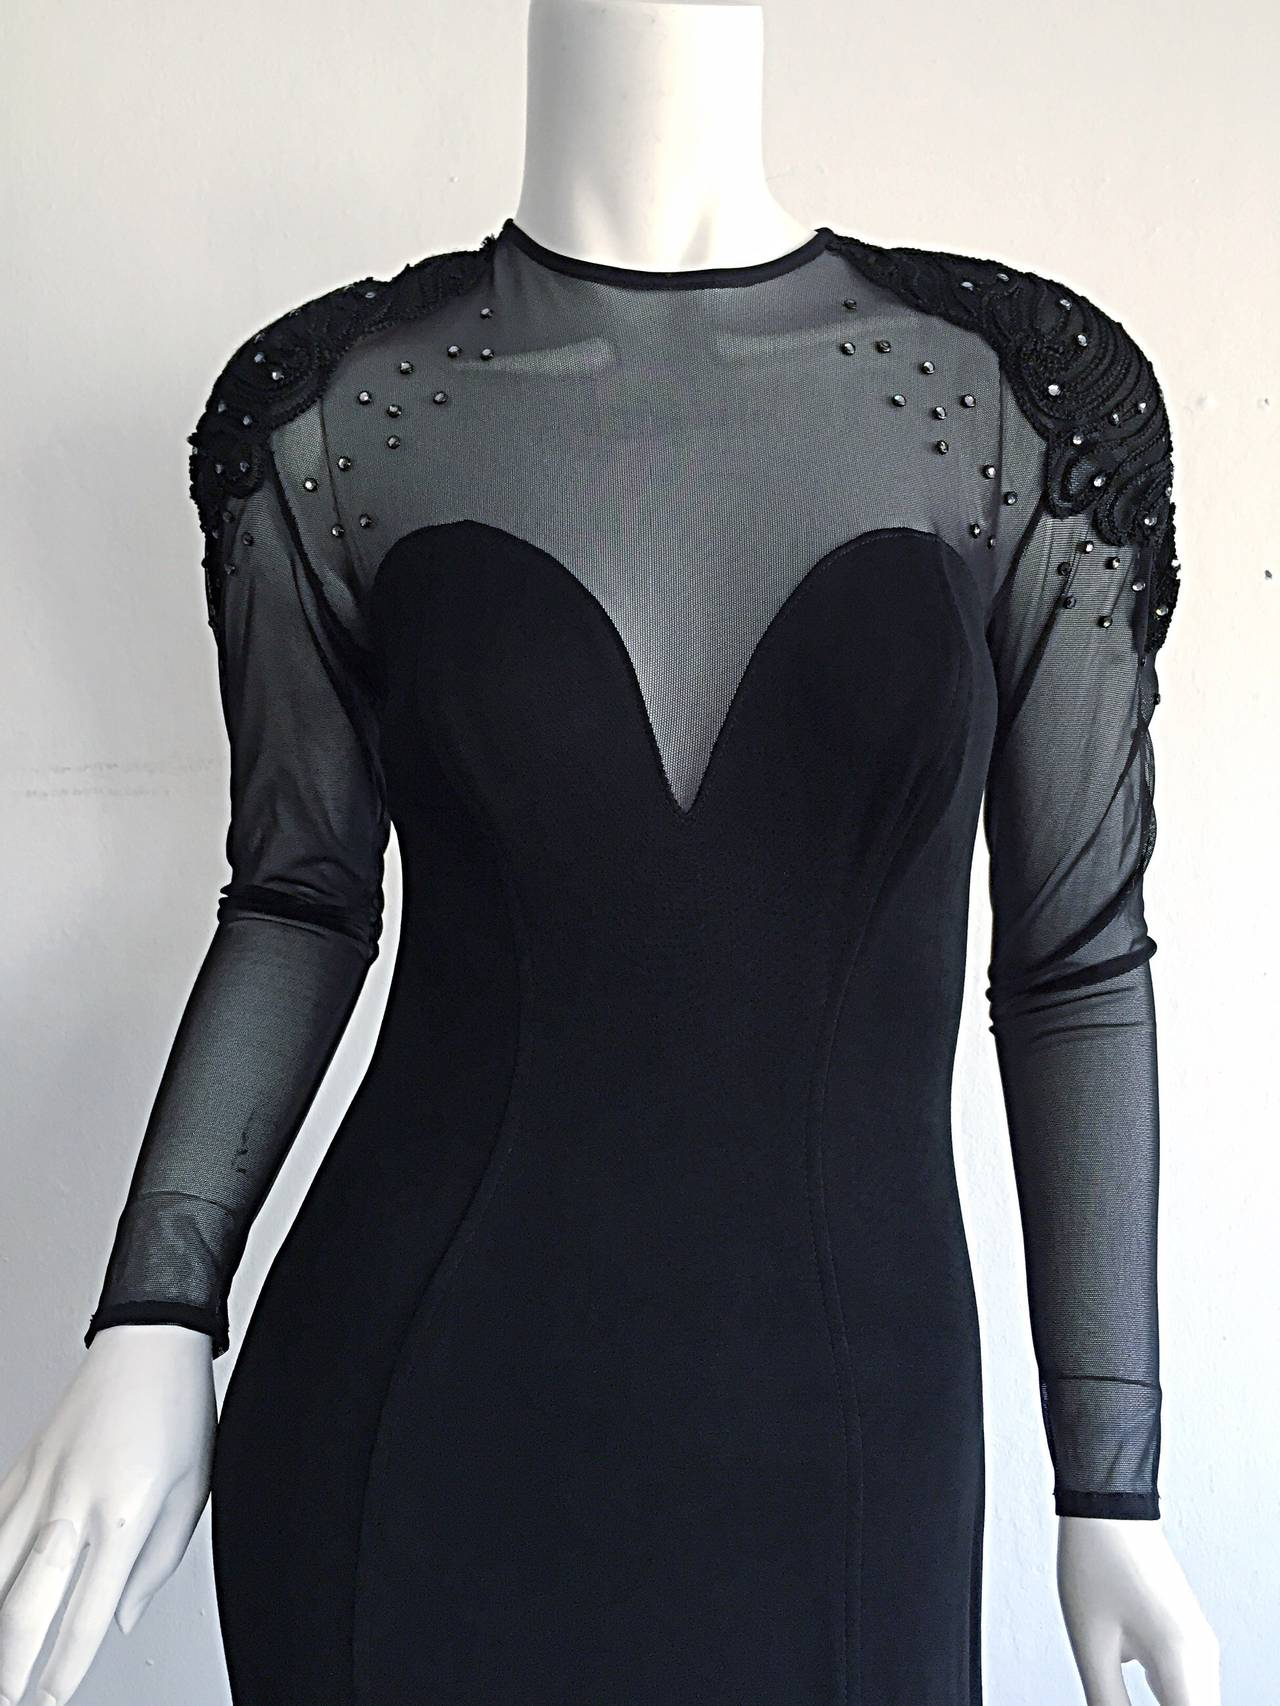 Sexy Vintage 1990s Black Cut - Out Bodycon Dress w/ Rhinestones 3